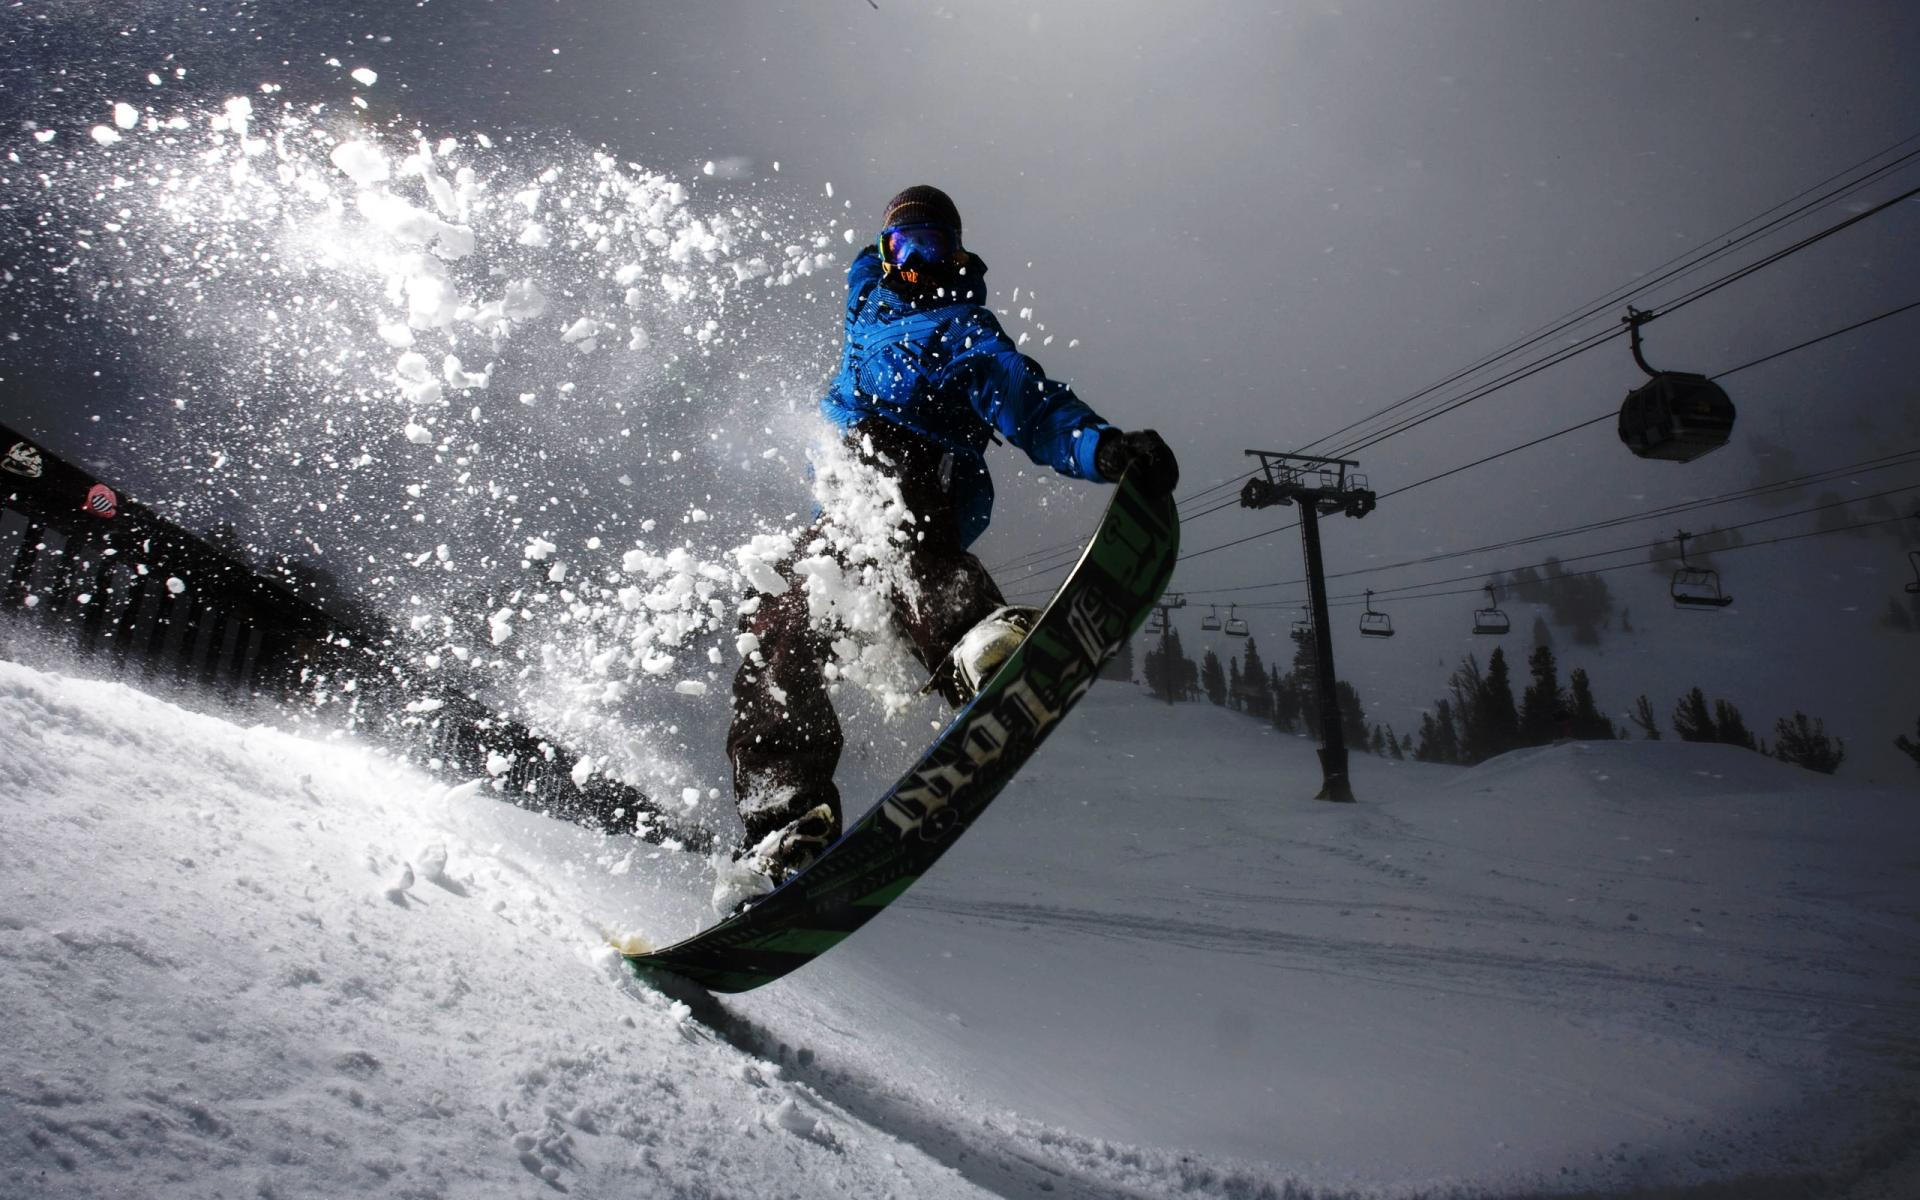 Snowboard Wallpapers – HD wallpaper